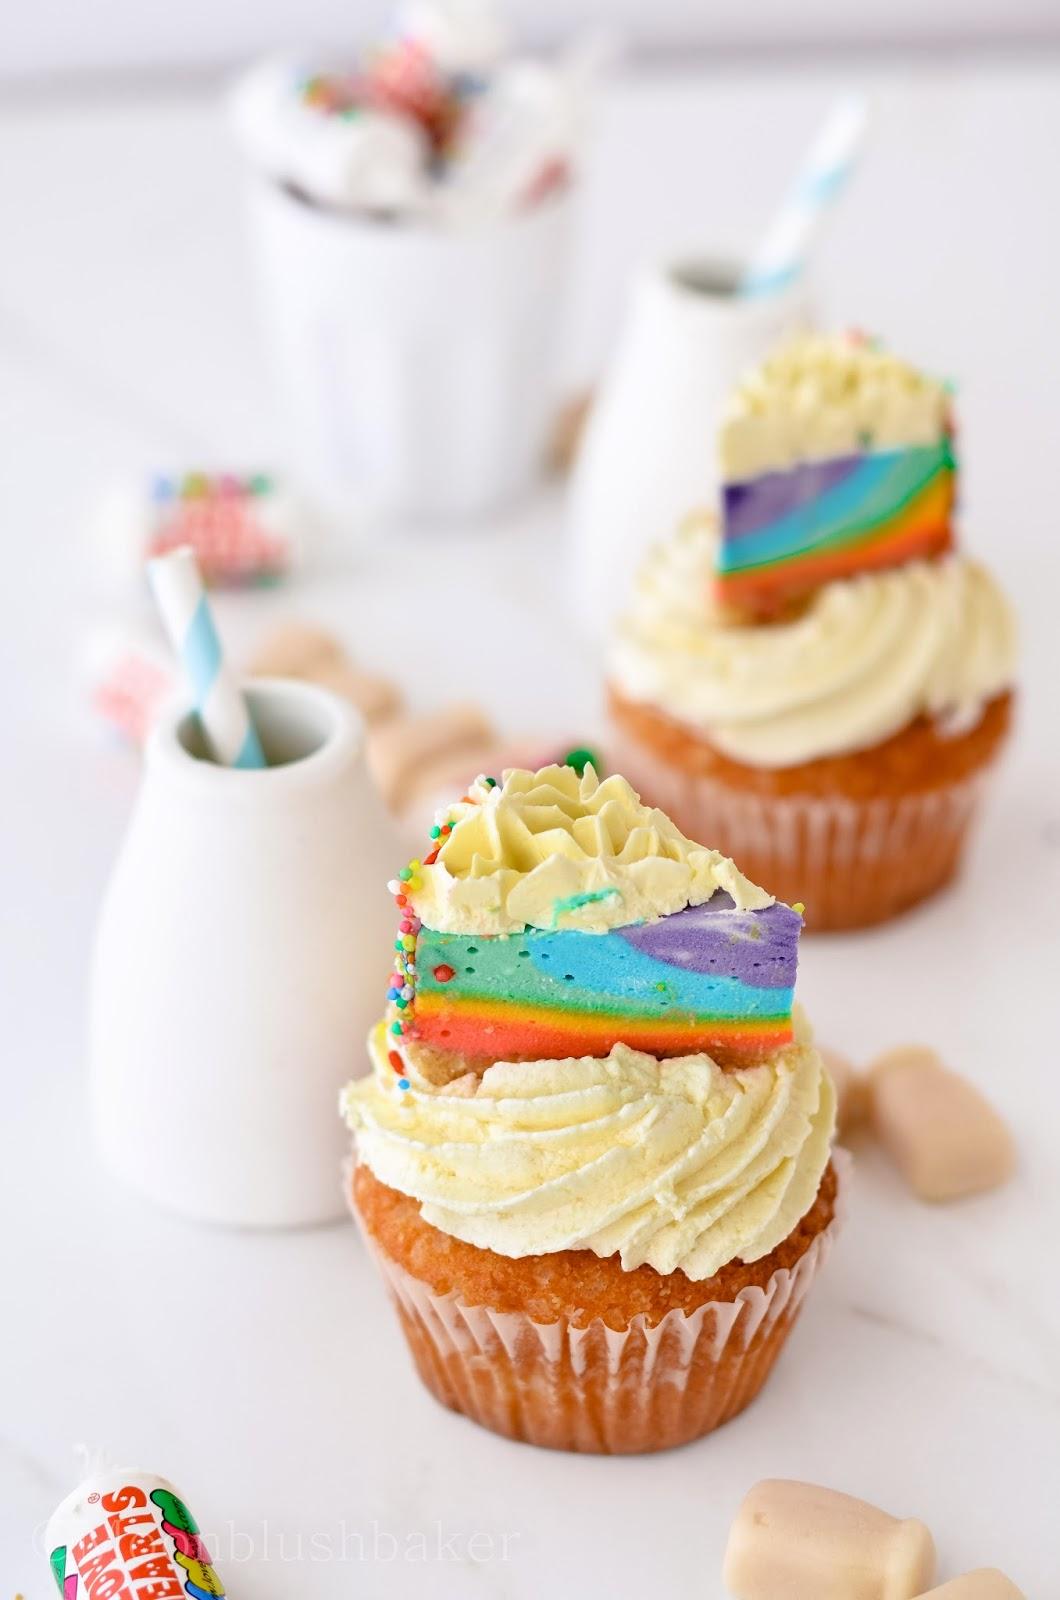 How Many Mini Cupcakes Does One Cake Mix Make